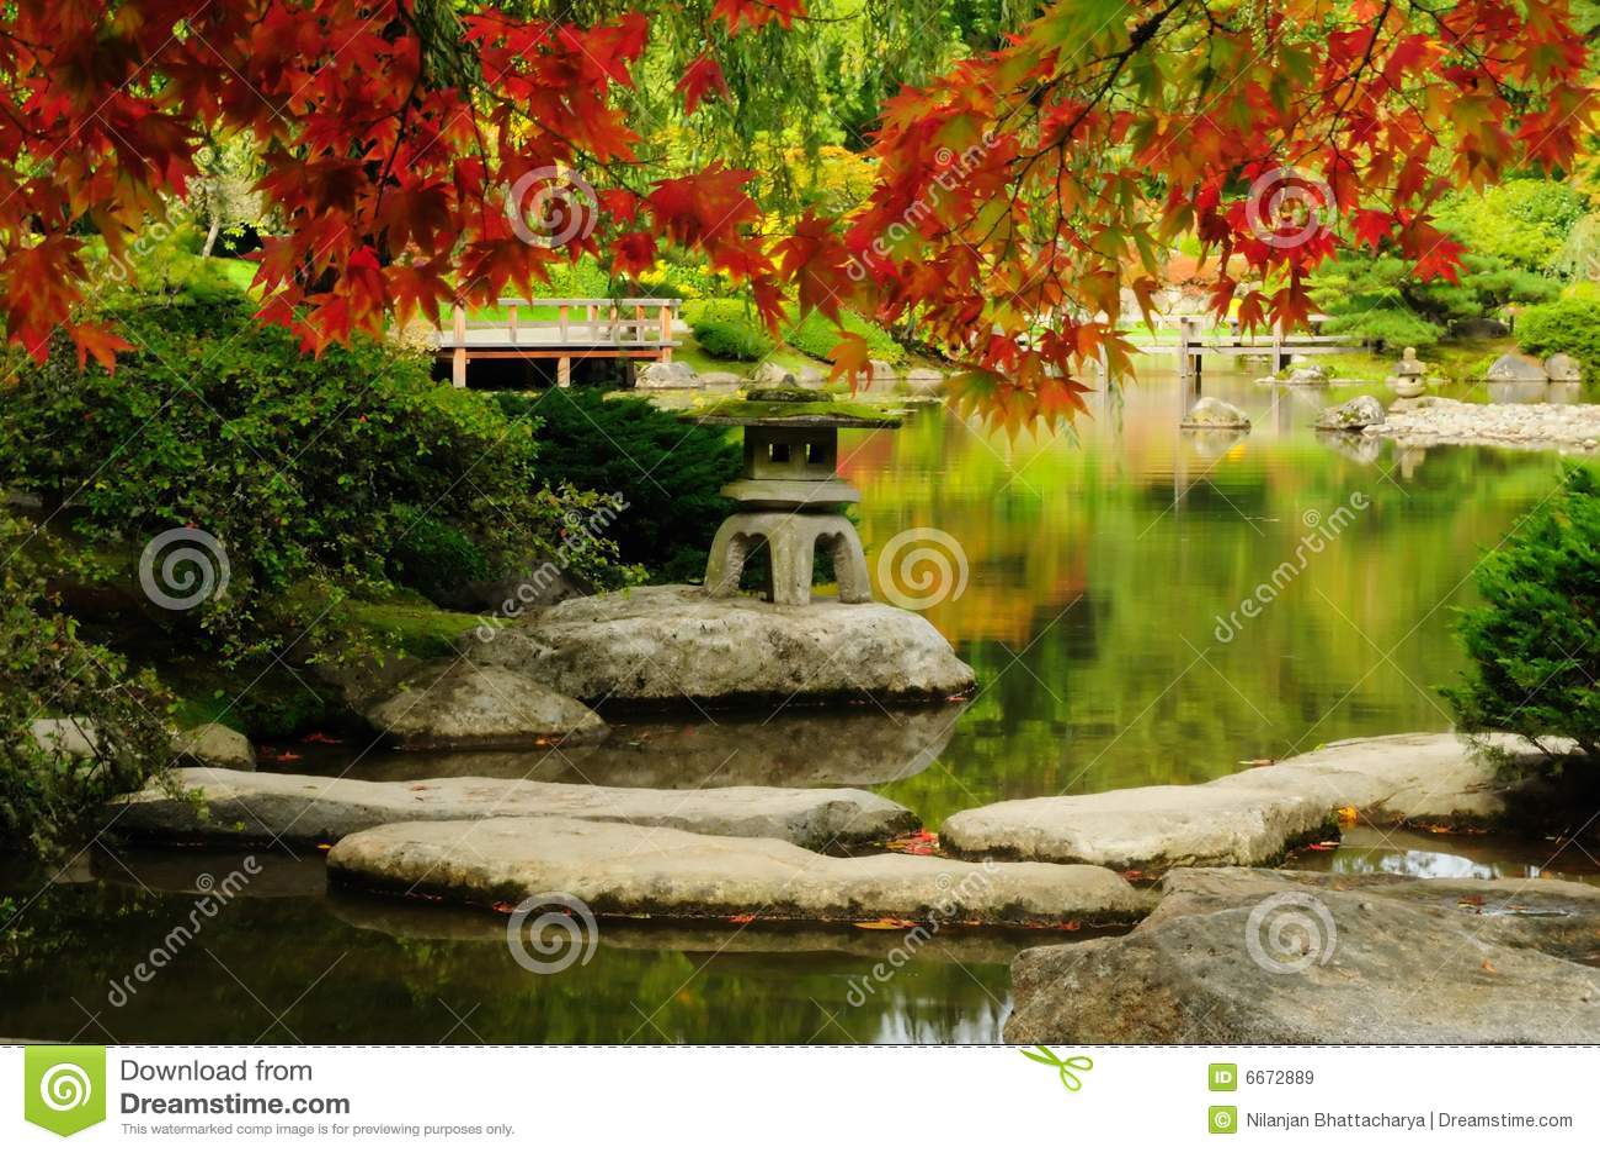 Jard n japon s hermoso en oto o for Jardines en otono